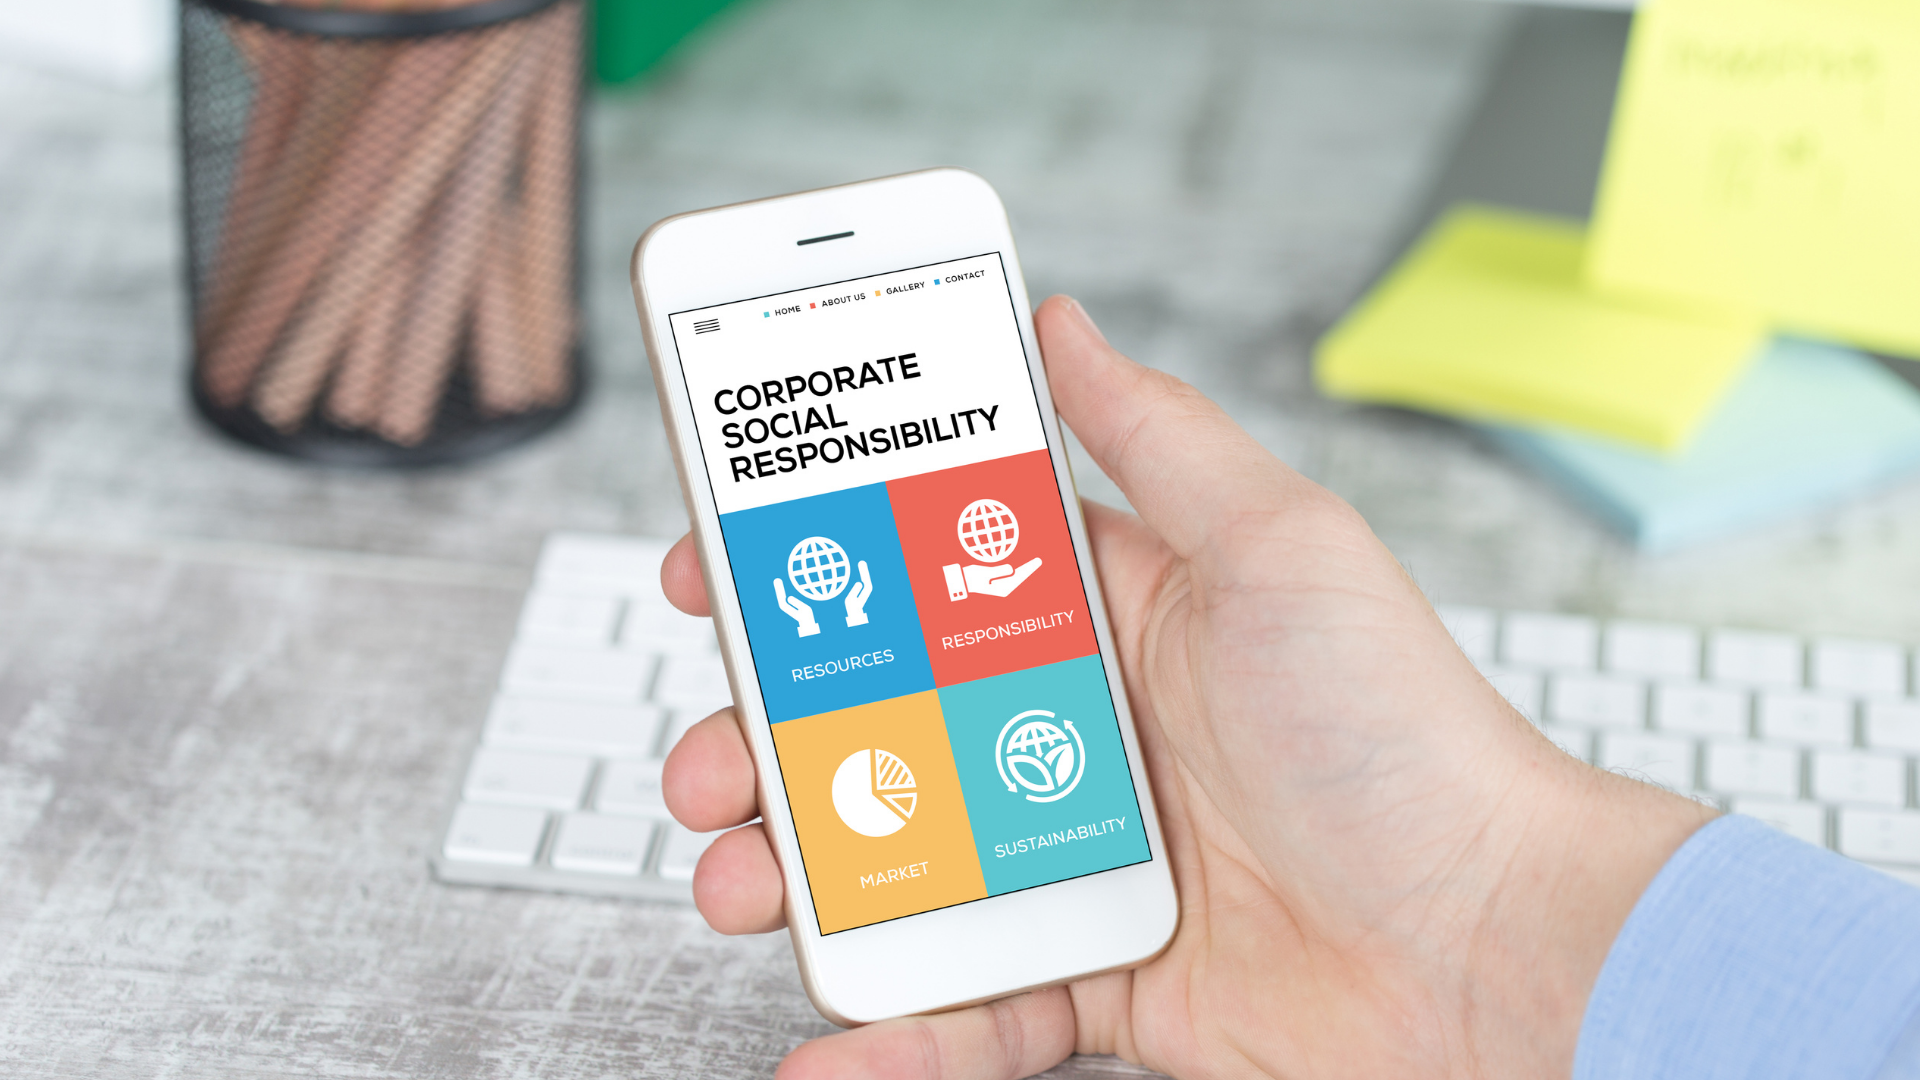 Corporate Social Responsibility (CSR) and social enterprises